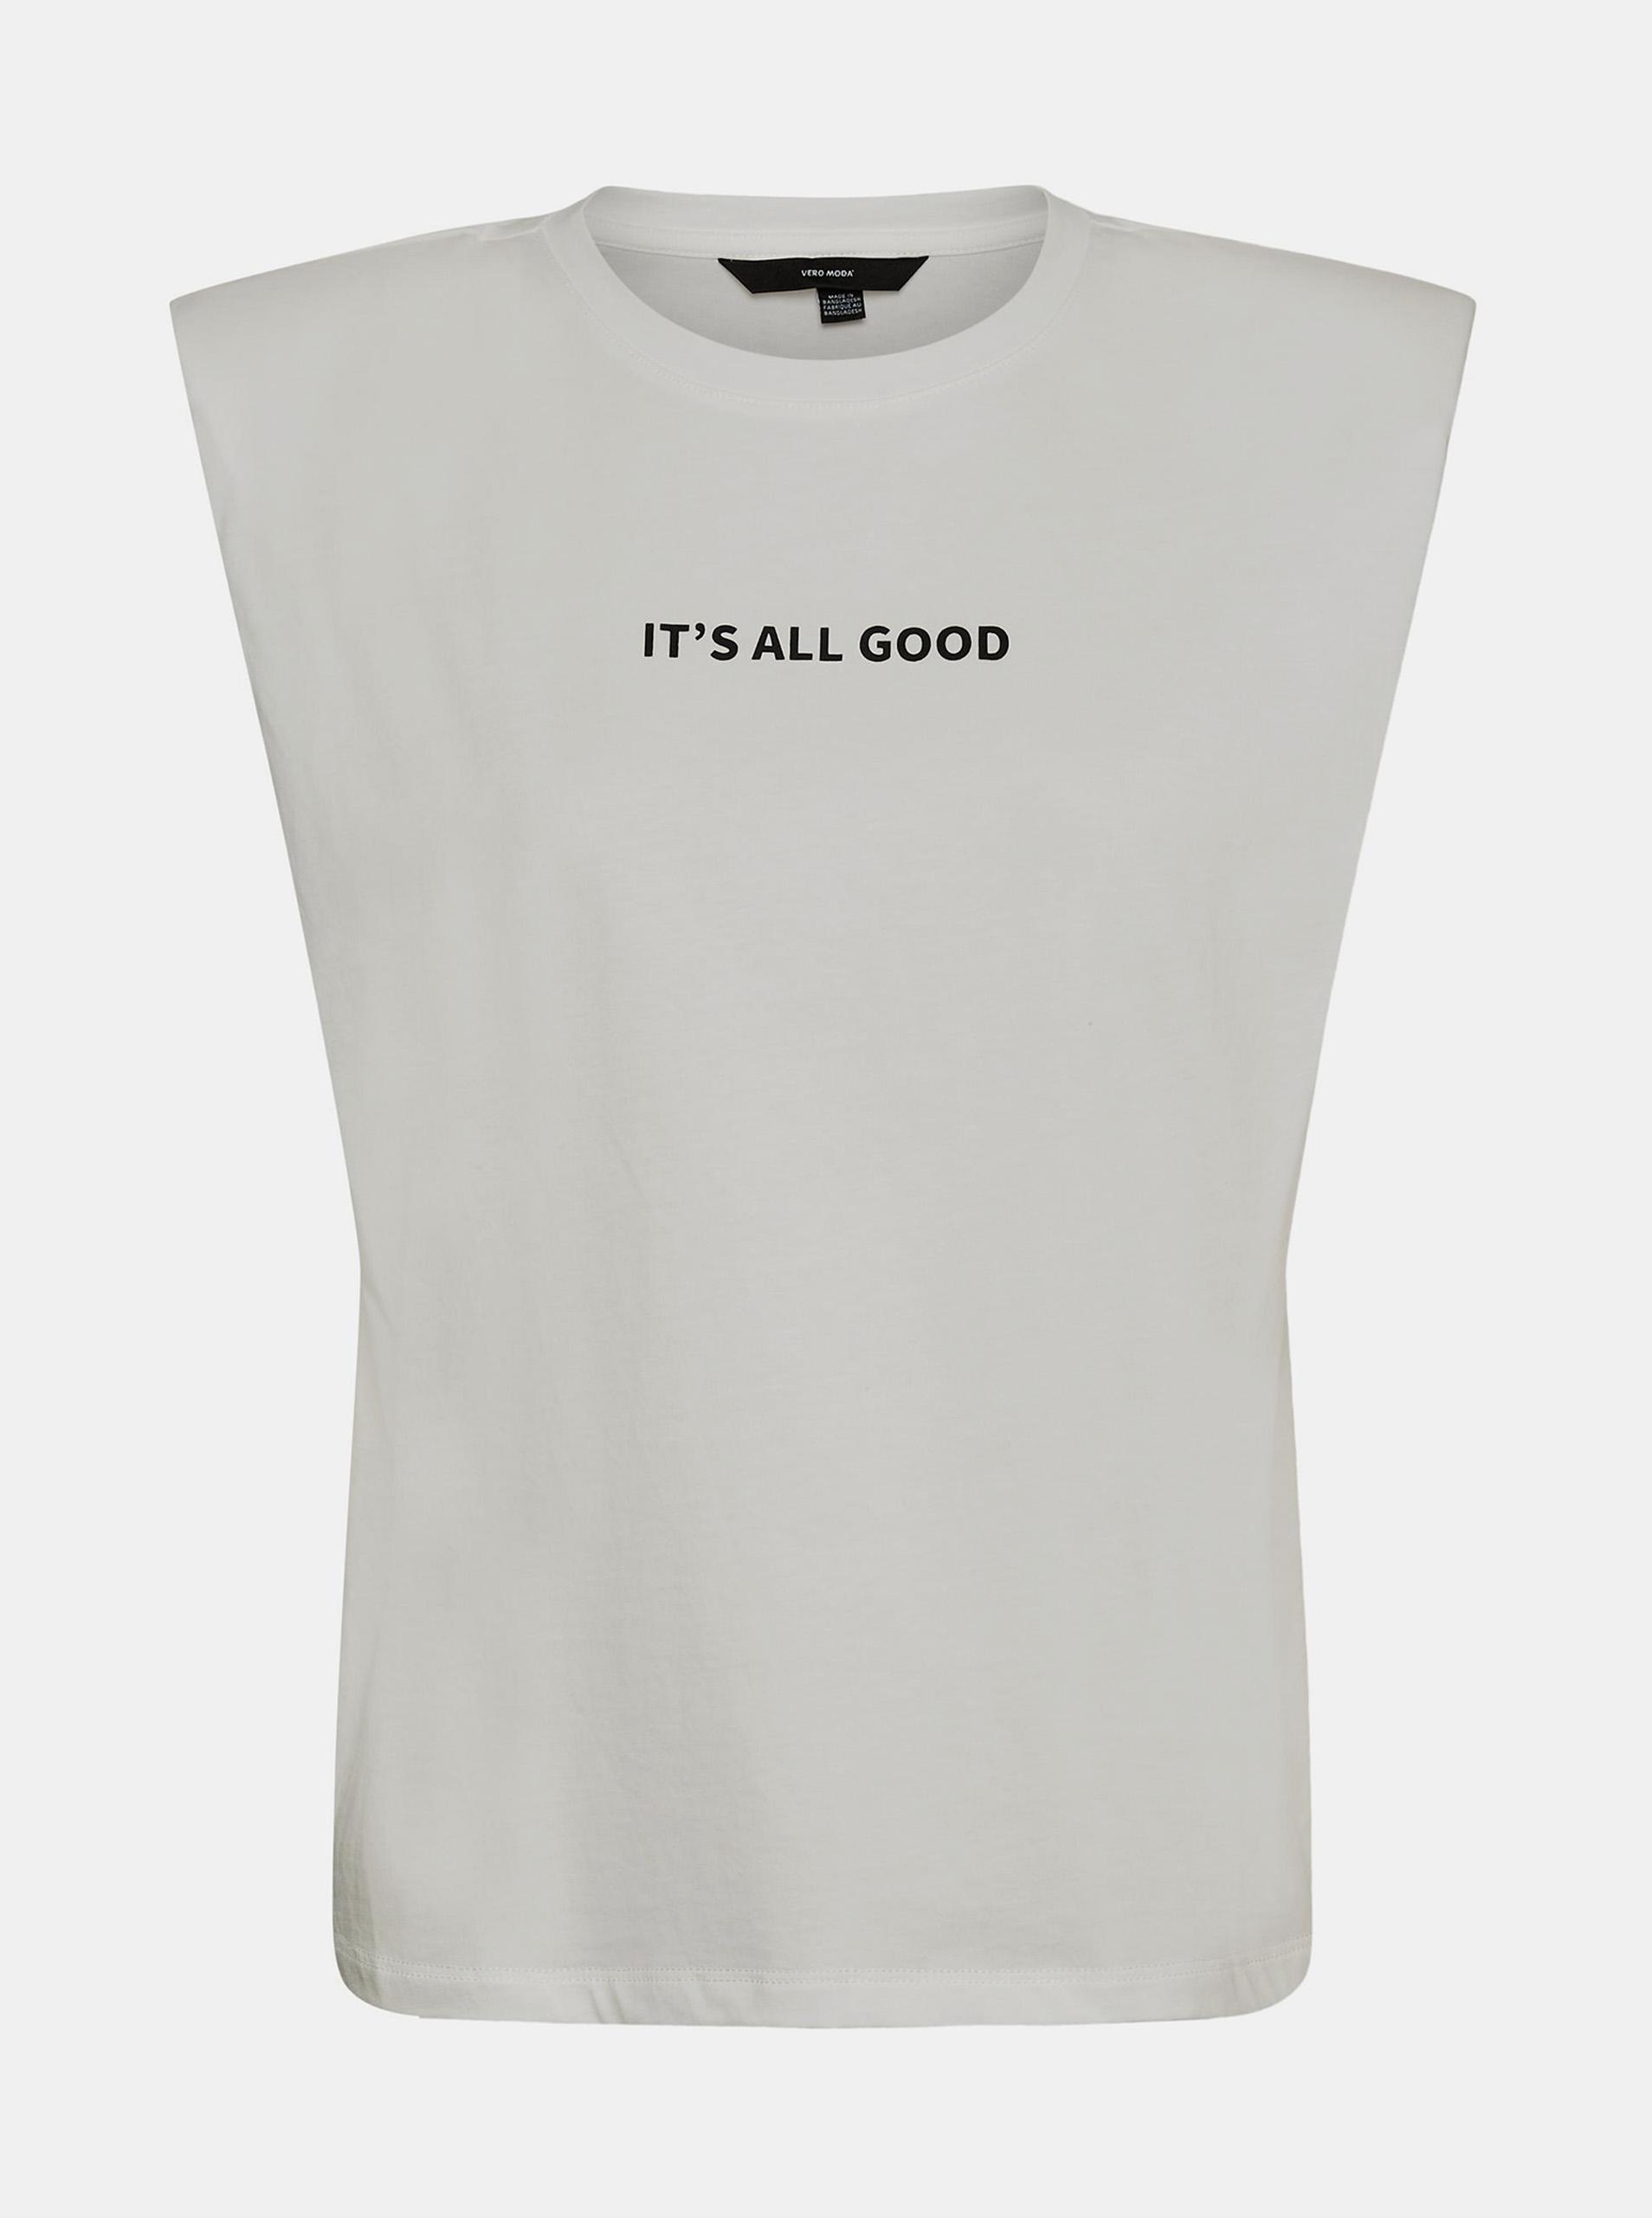 Vero Moda bela majica Hollie